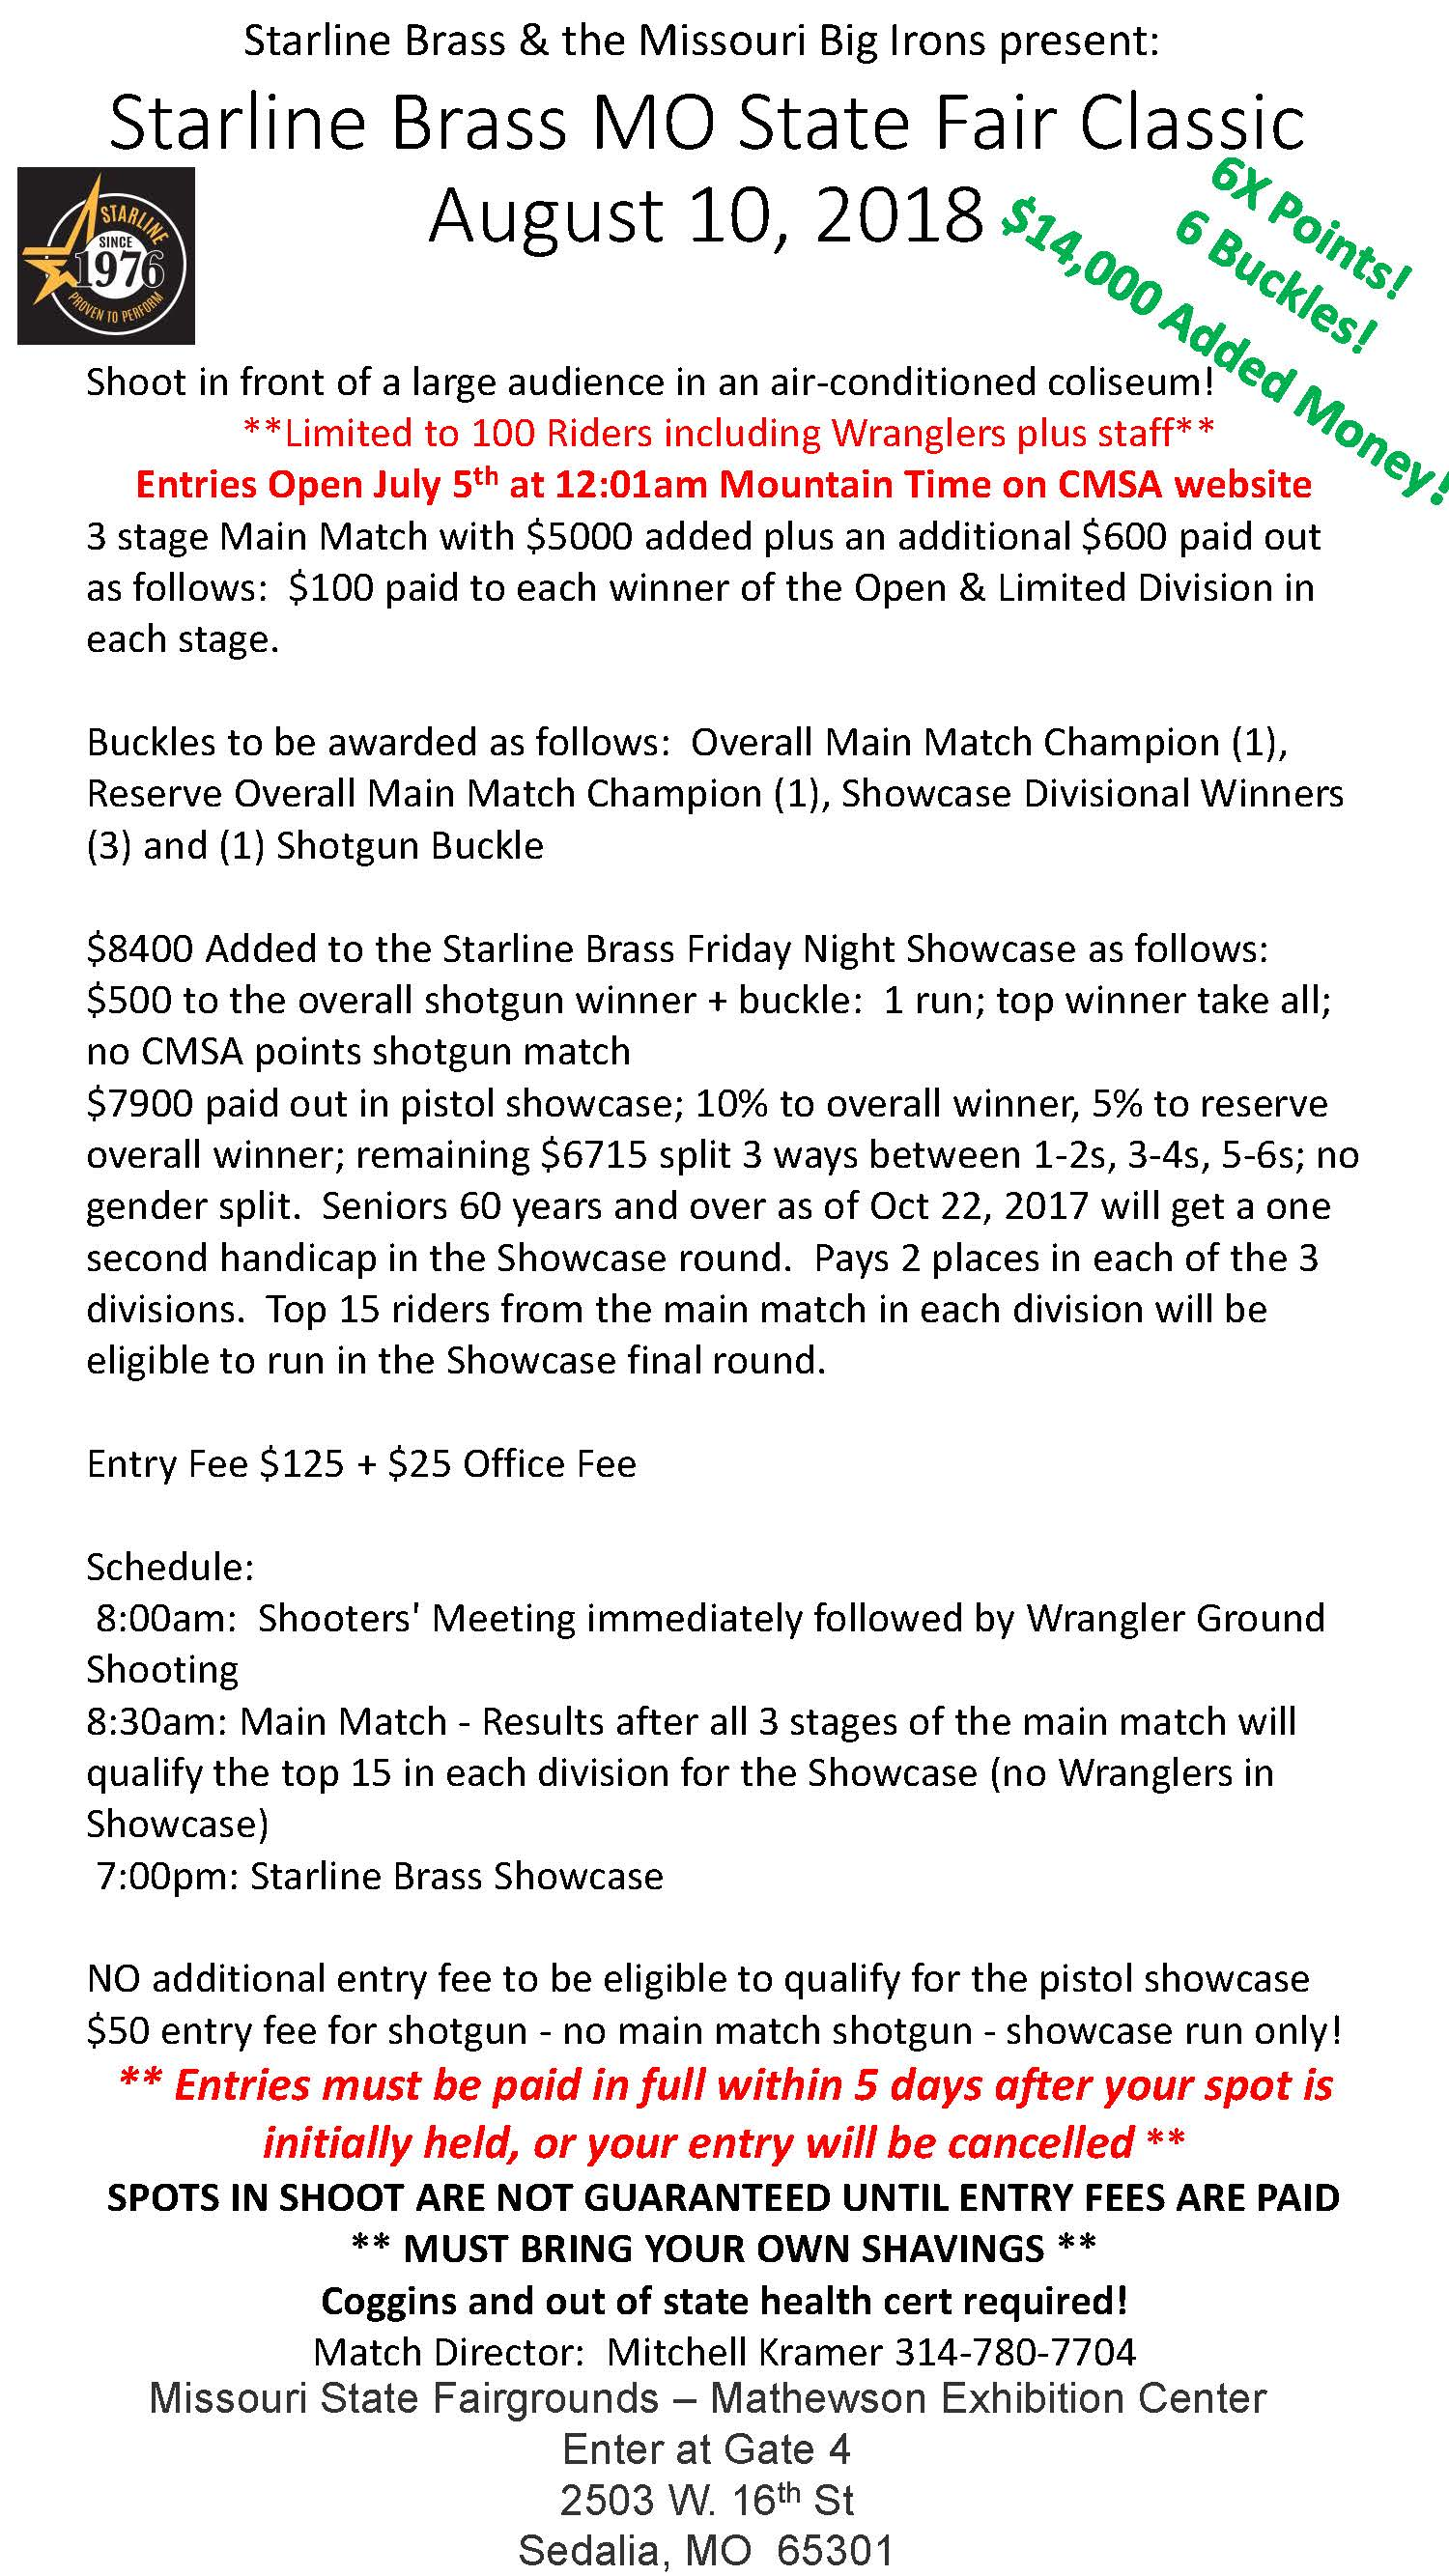 Starline Brass MO State Fair Shoot